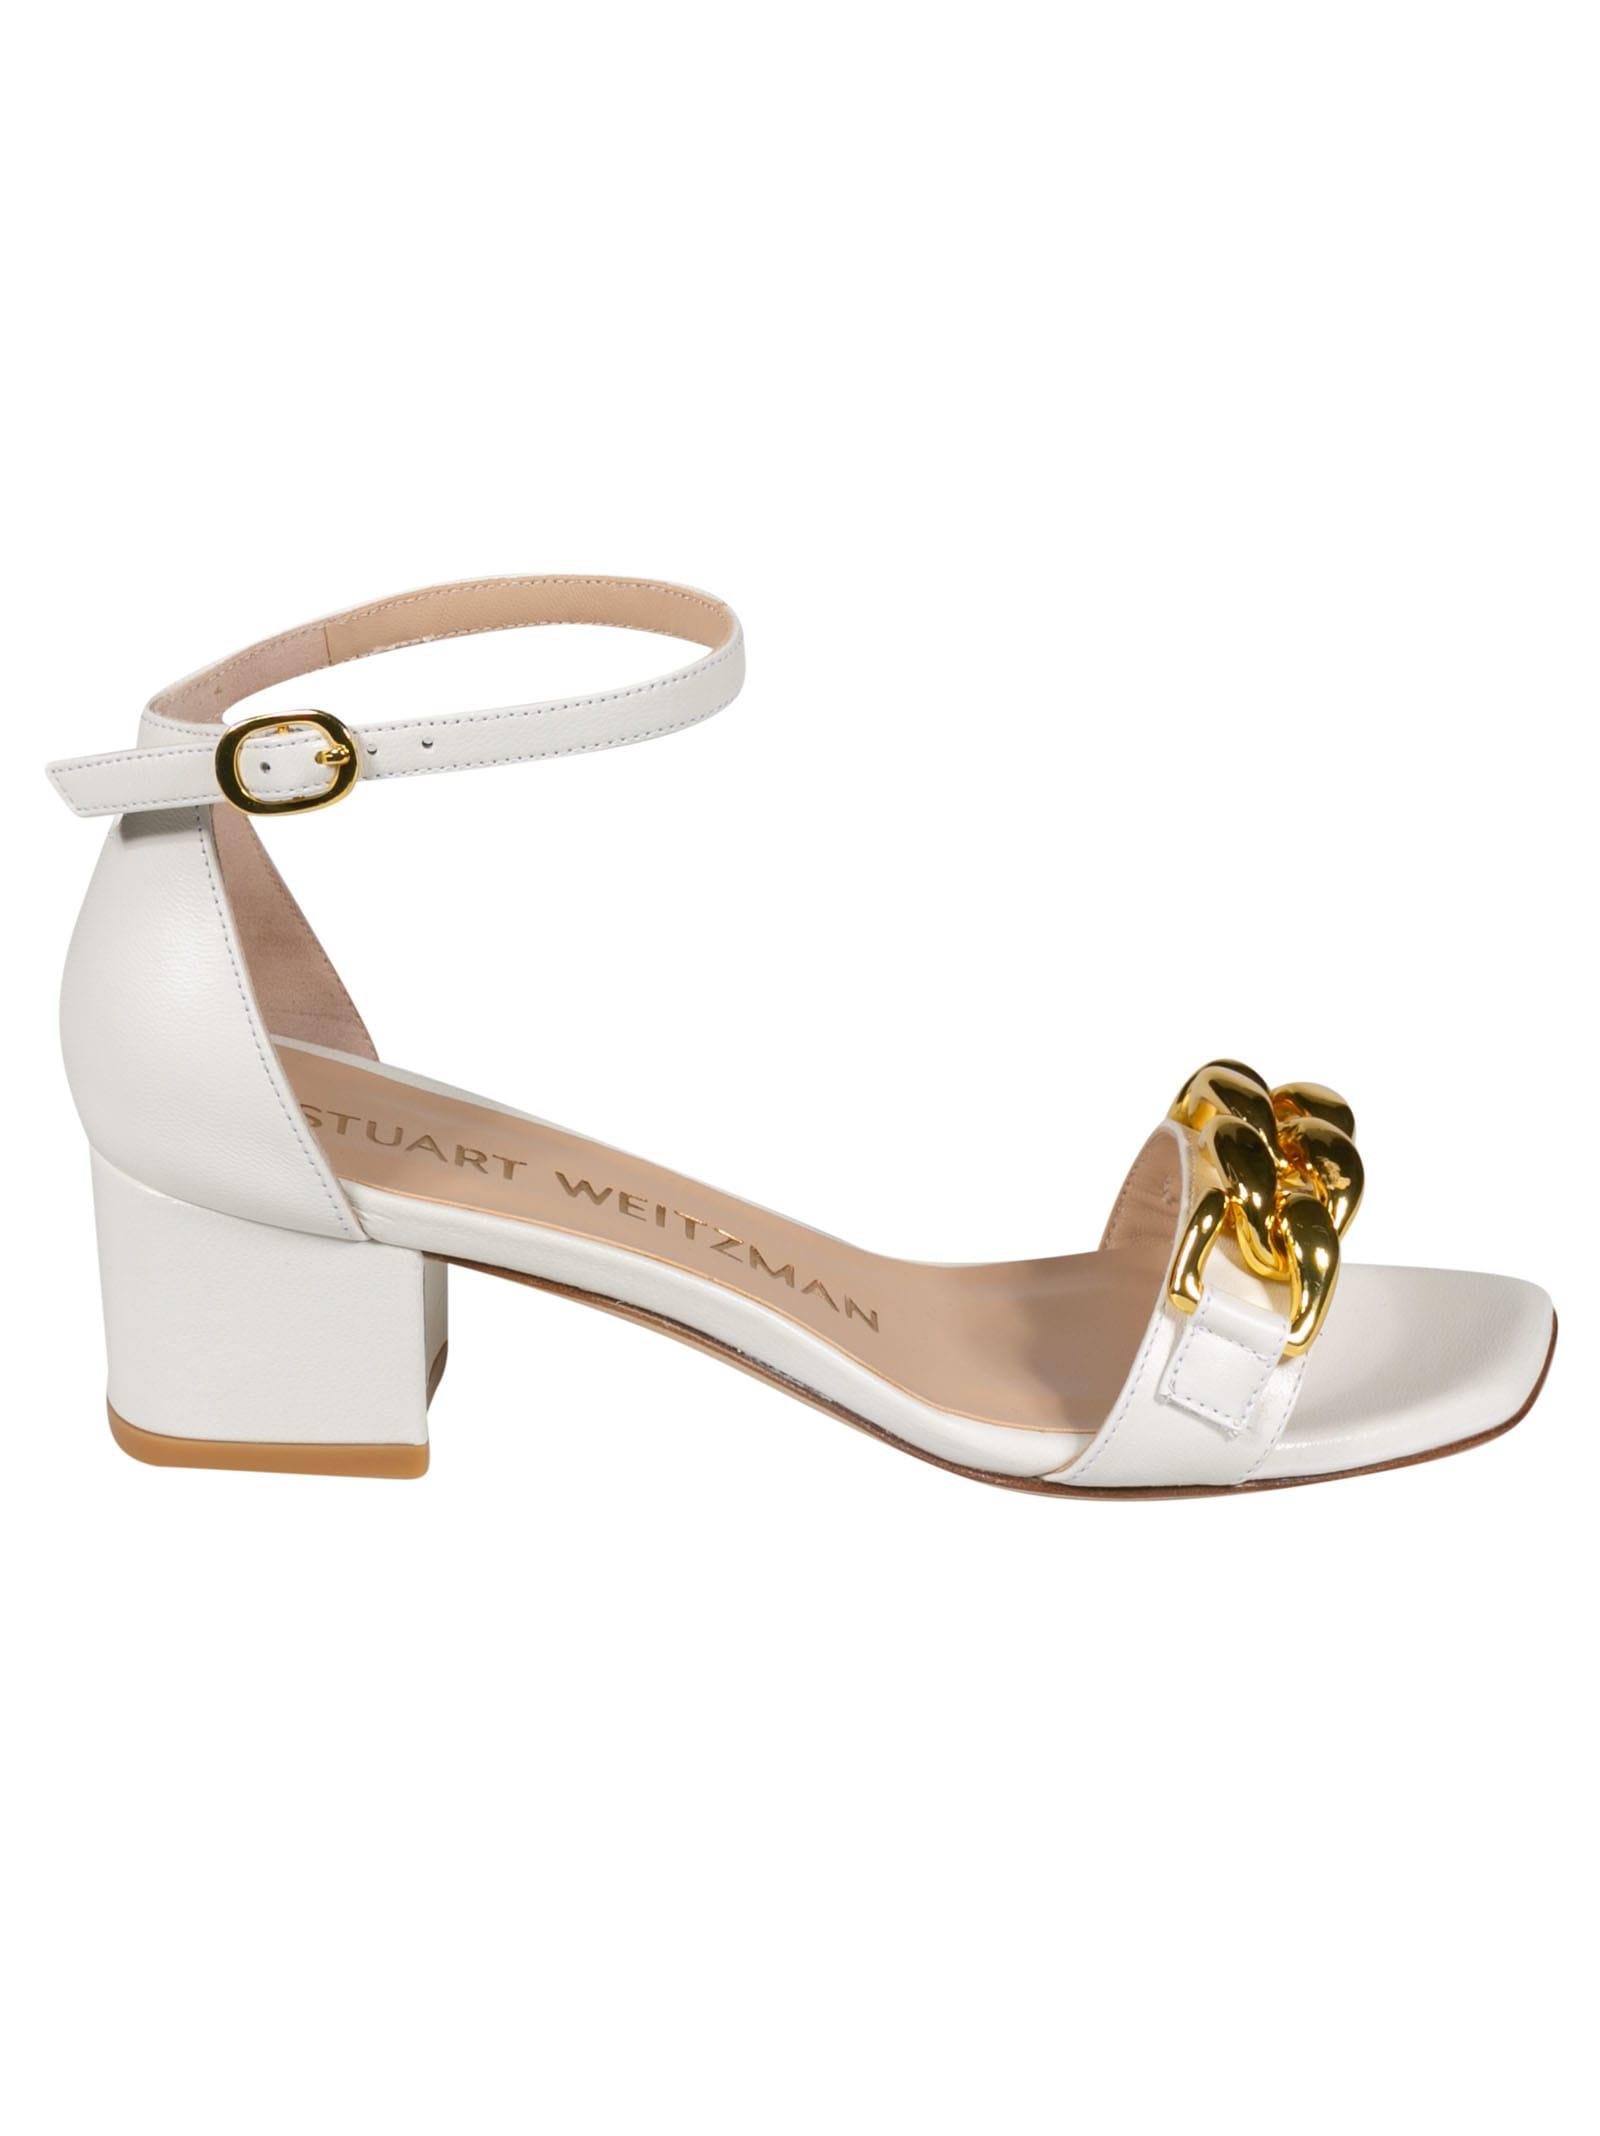 Buy Stuart Weitzman Amelina Block Heel Sandals online, shop Stuart Weitzman shoes with free shipping